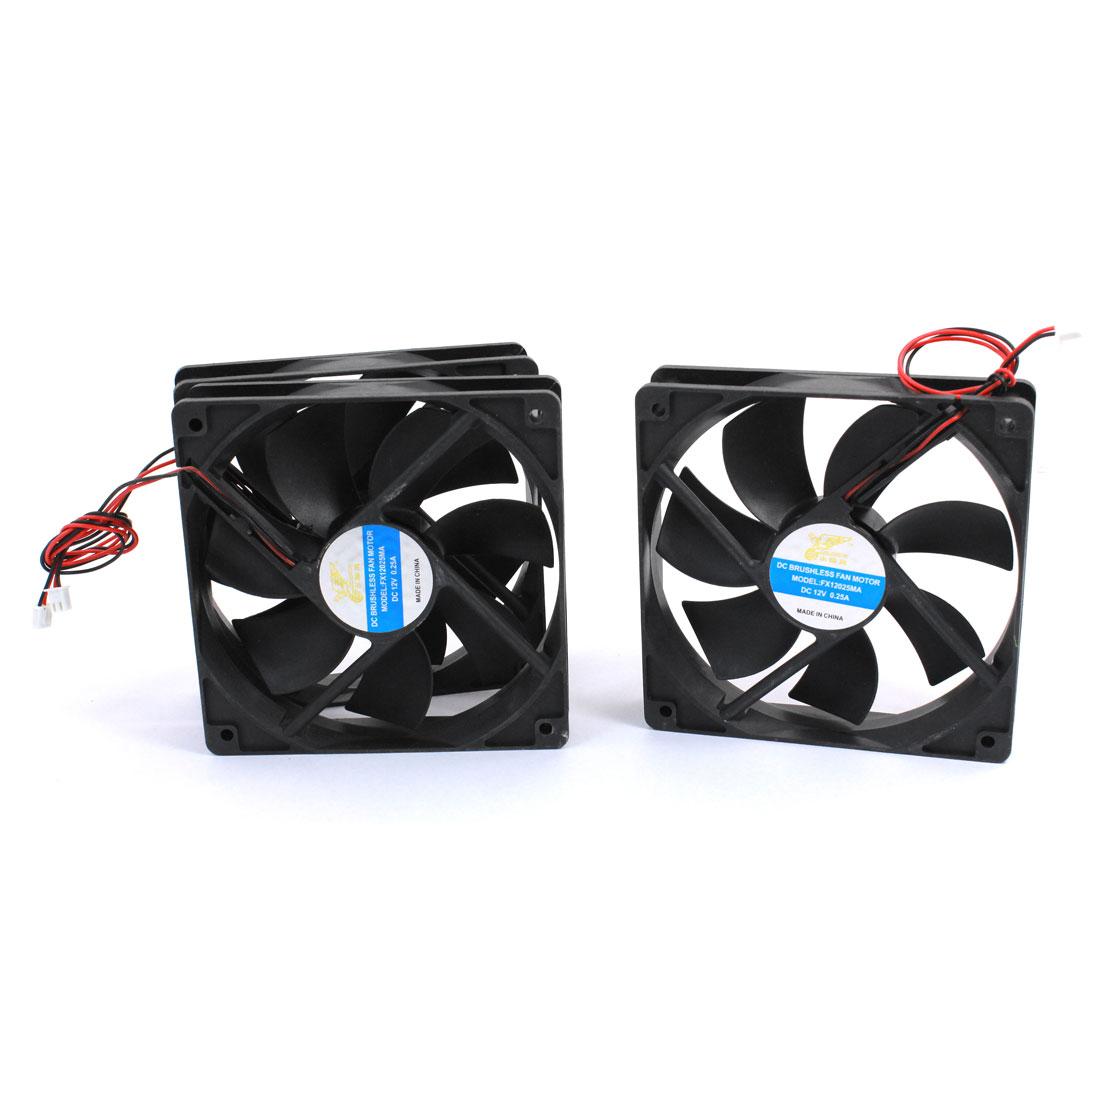 DC 12V 0.25A FX12025MA Brushless Cooling Cooler Fan 120mmx120mmx25mm Black 3pcs